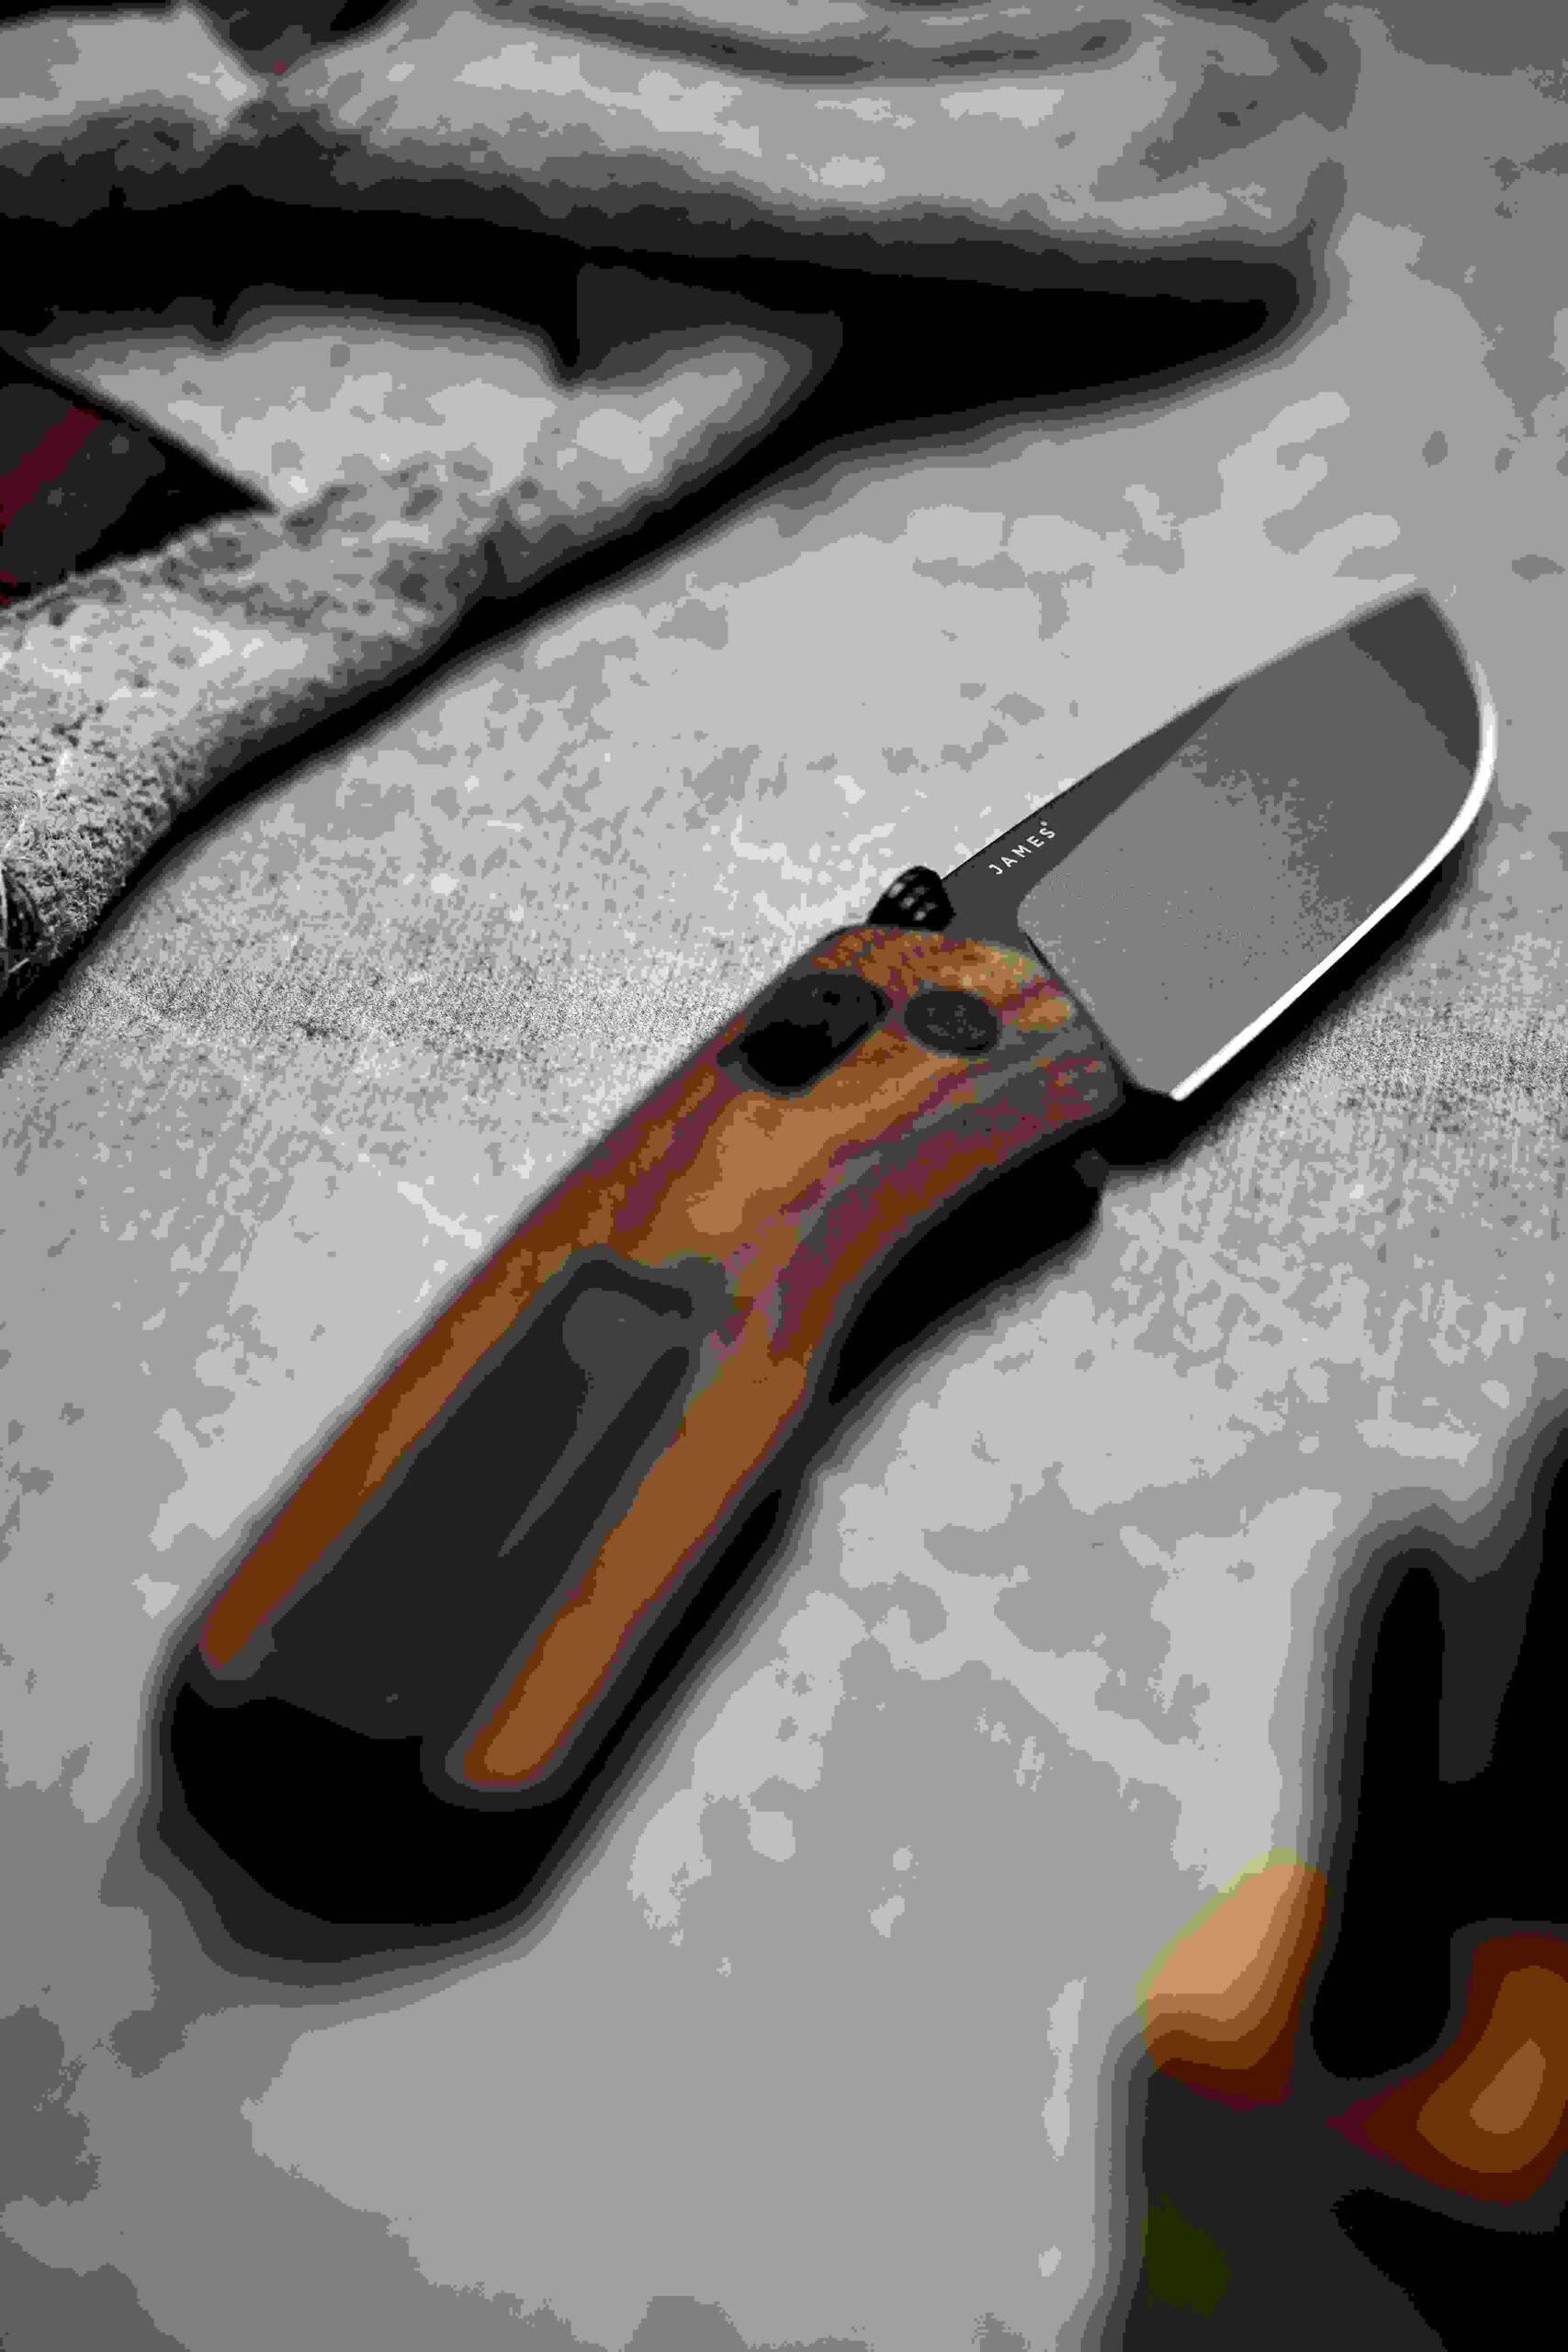 best self-defense knife